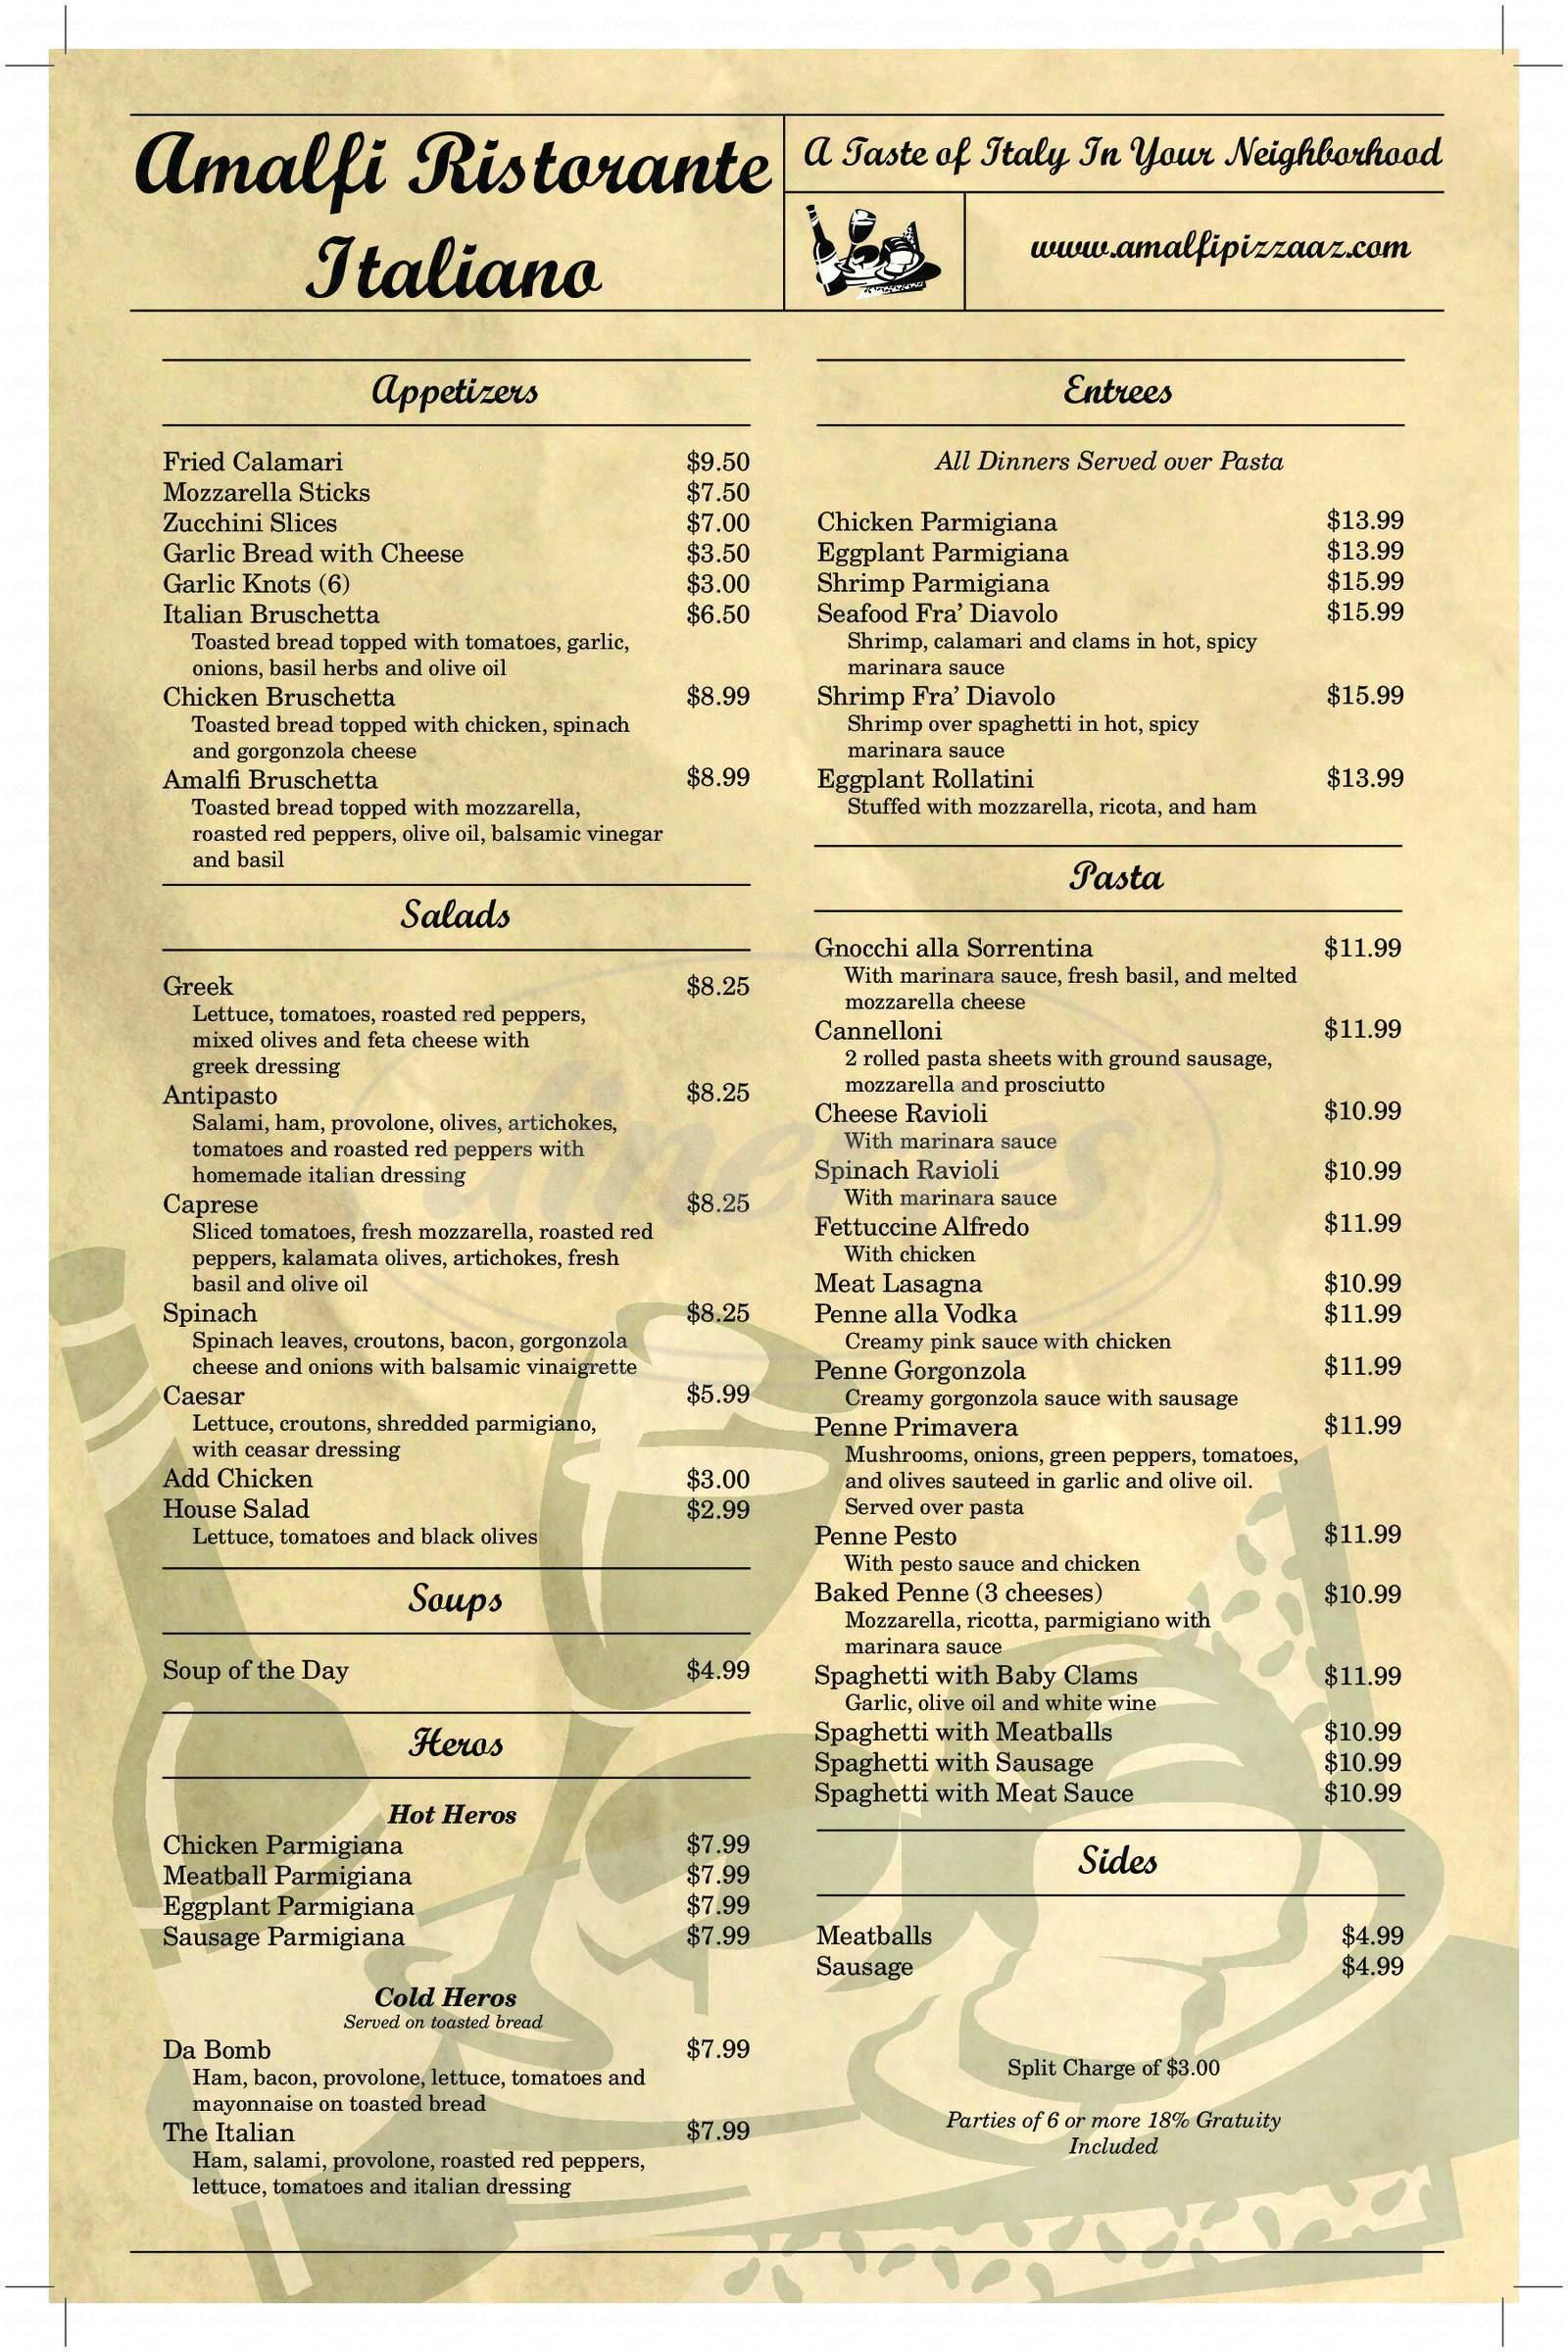 menu for Amalfi Ristorante Italiano